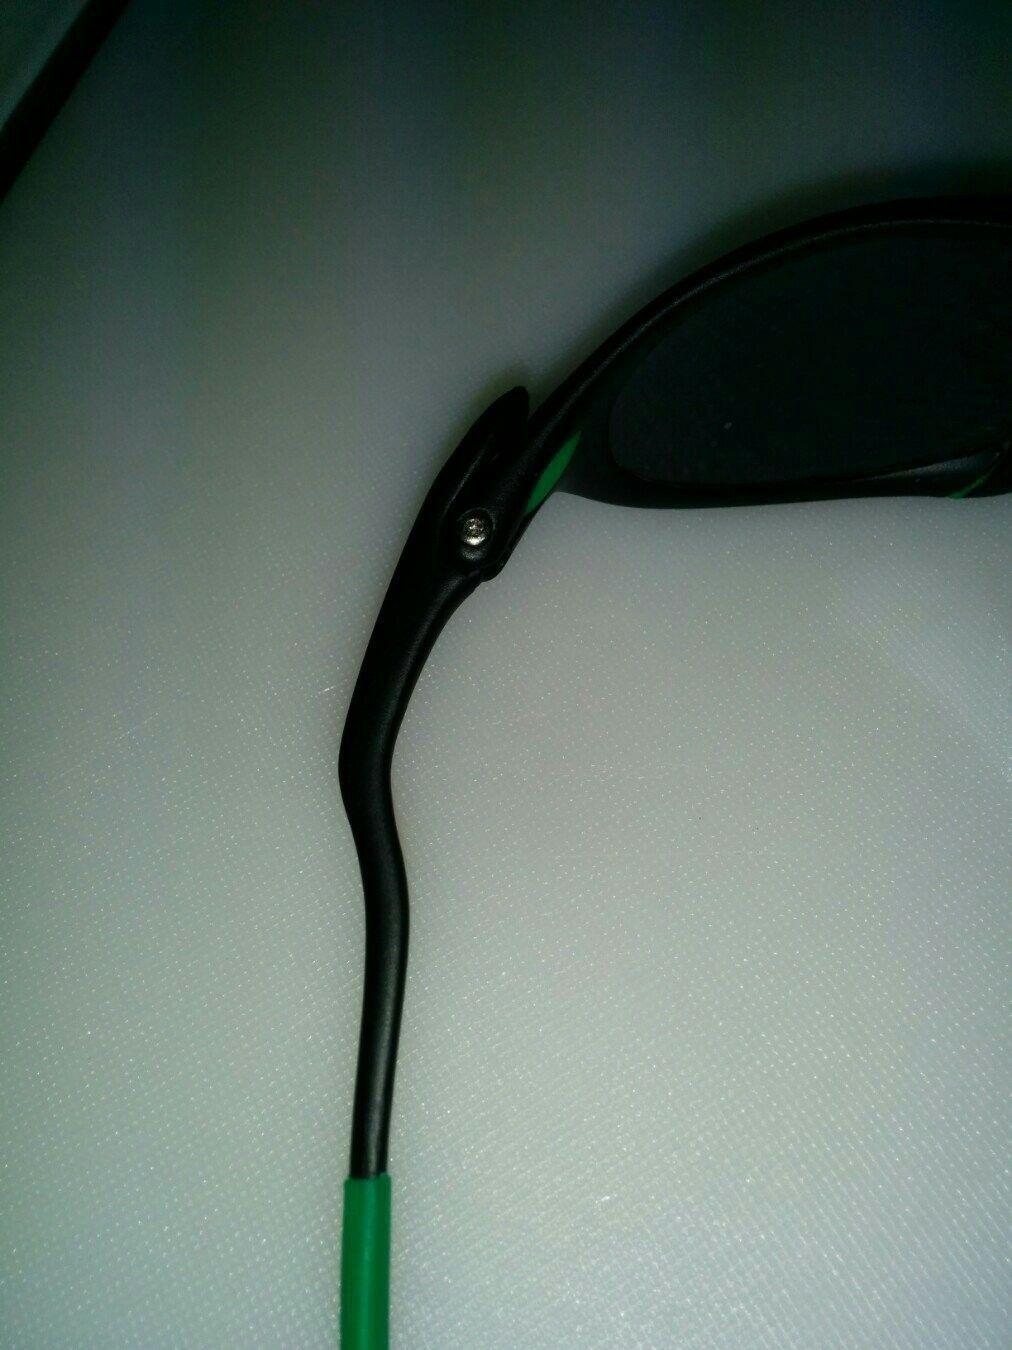 Custom Xman Matte Black R1 - 9uheredu.jpg